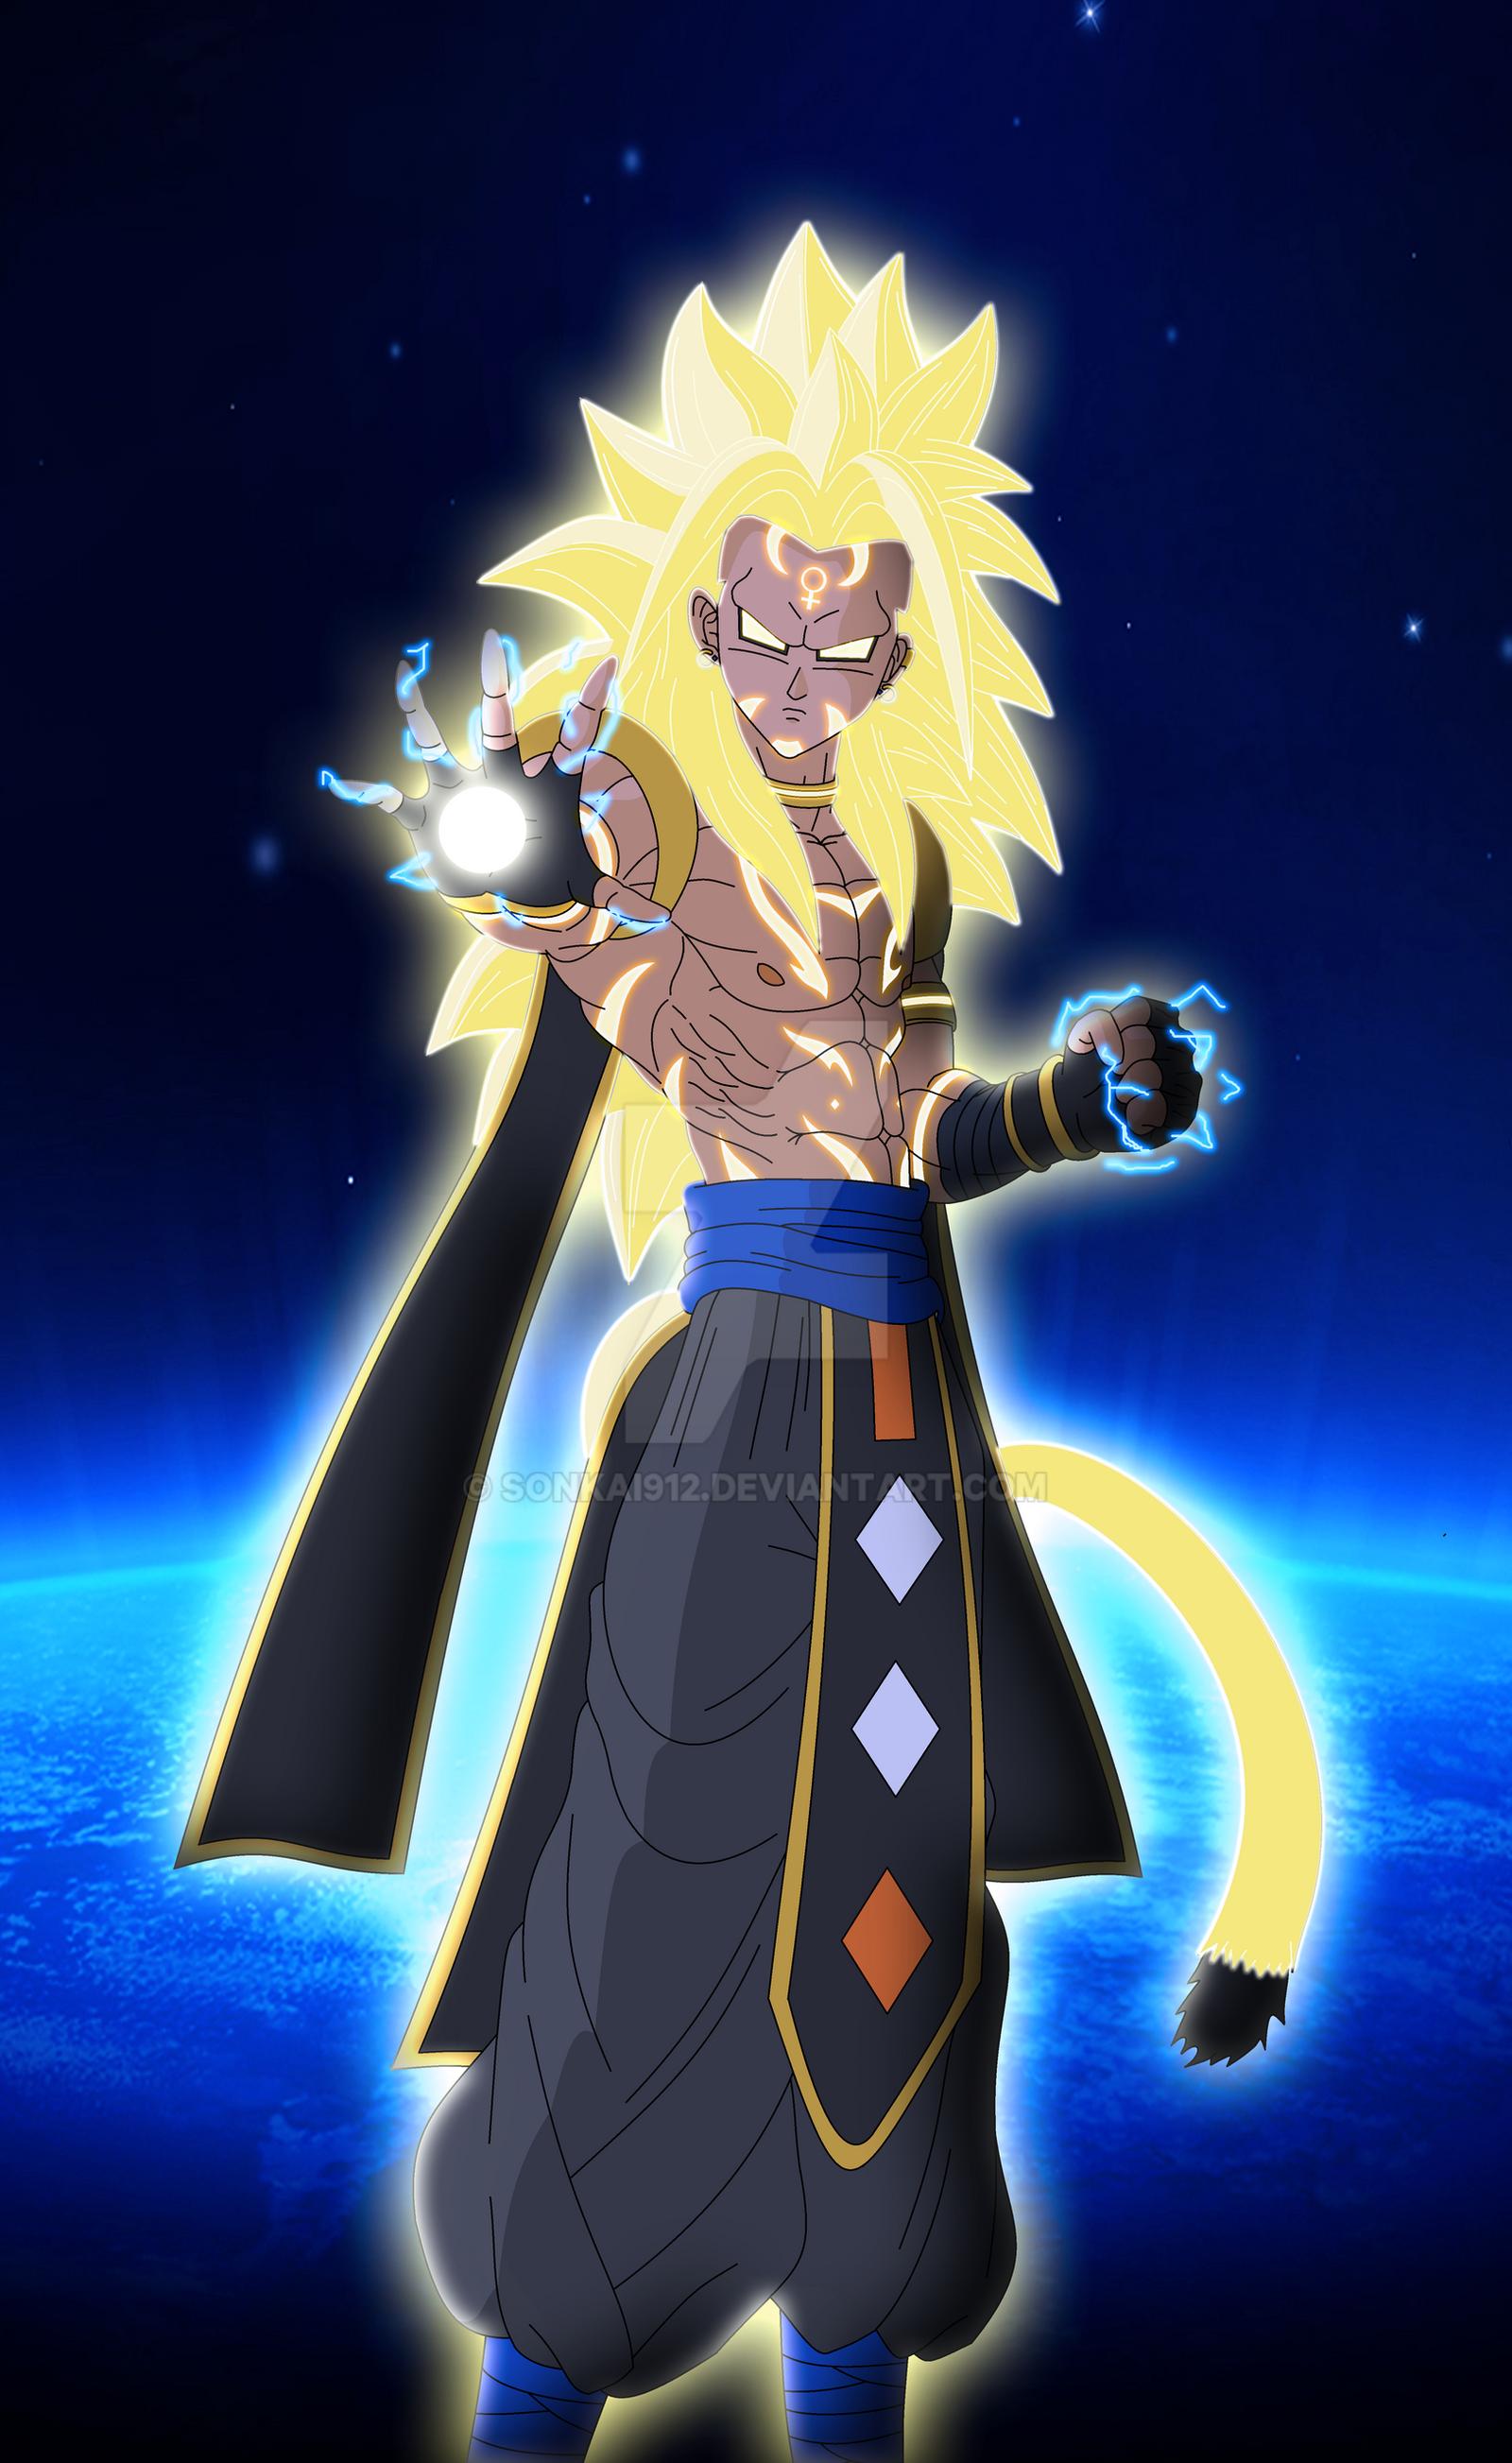 Image Result For Anime Backgrounda